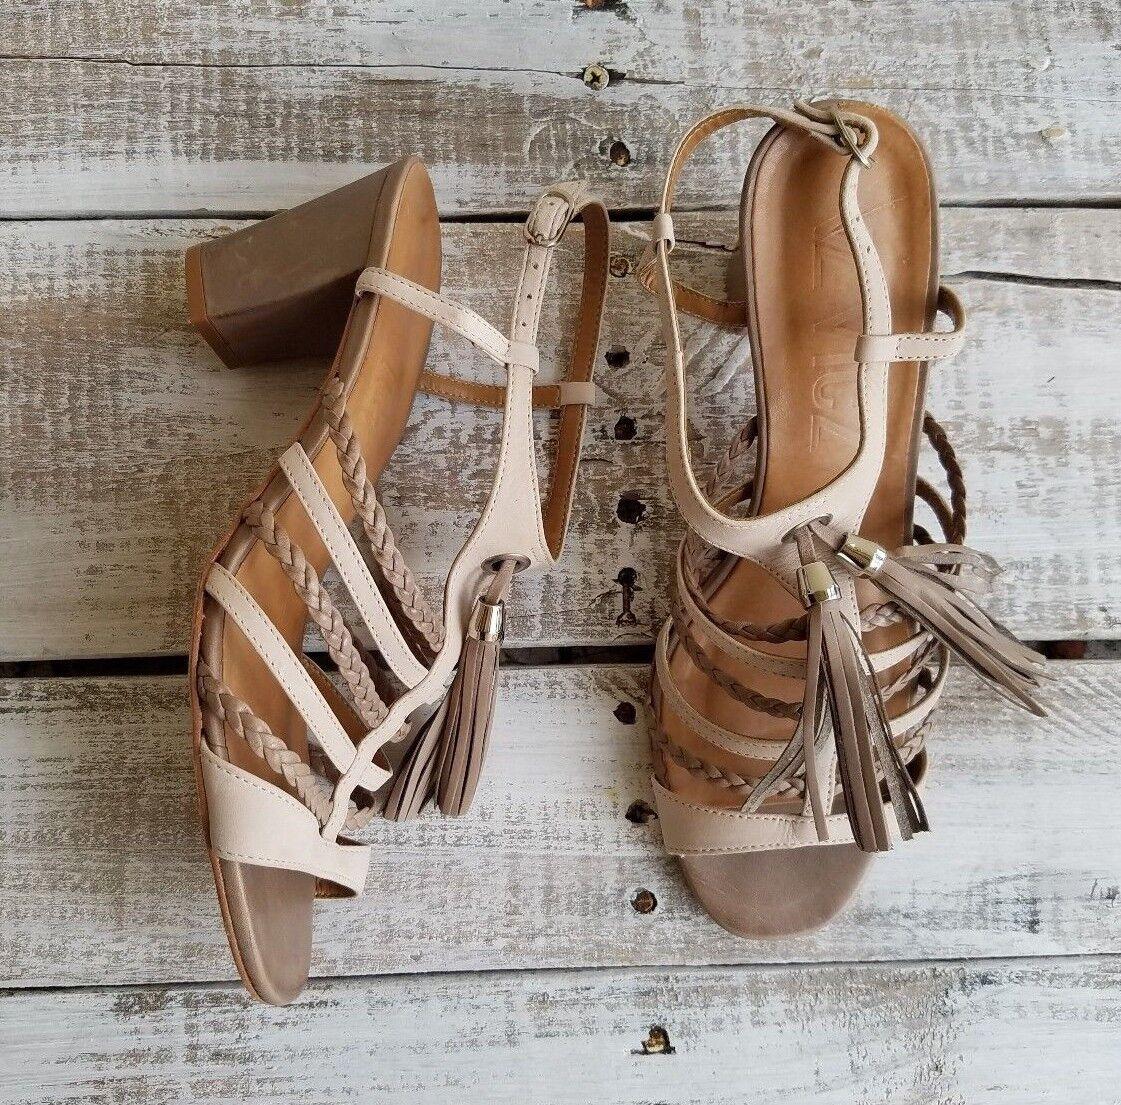 VZ VICZ Vero Cuoio  women sandals size 39 beige heels casual brown clasp club